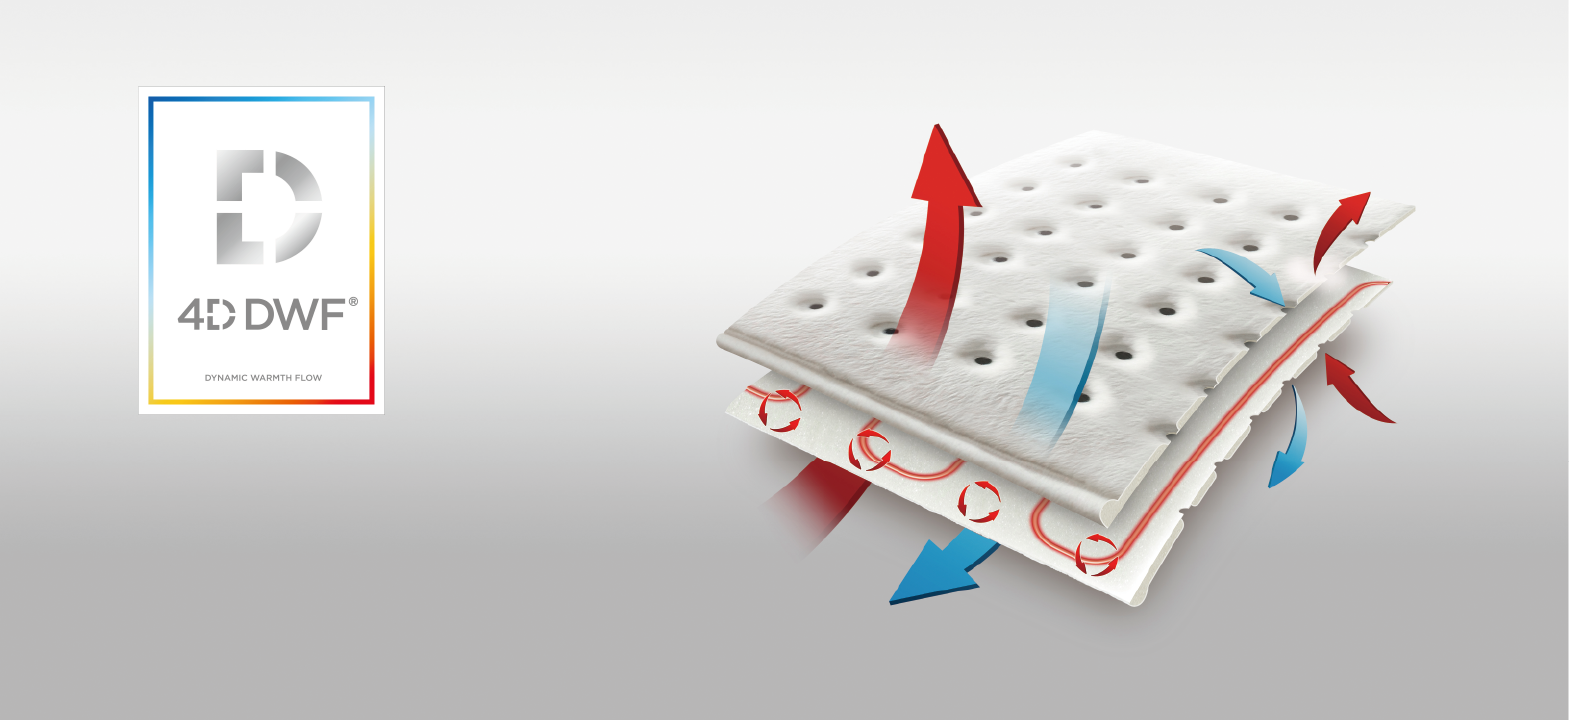 4d dynamic warmth flow (4D DWF)